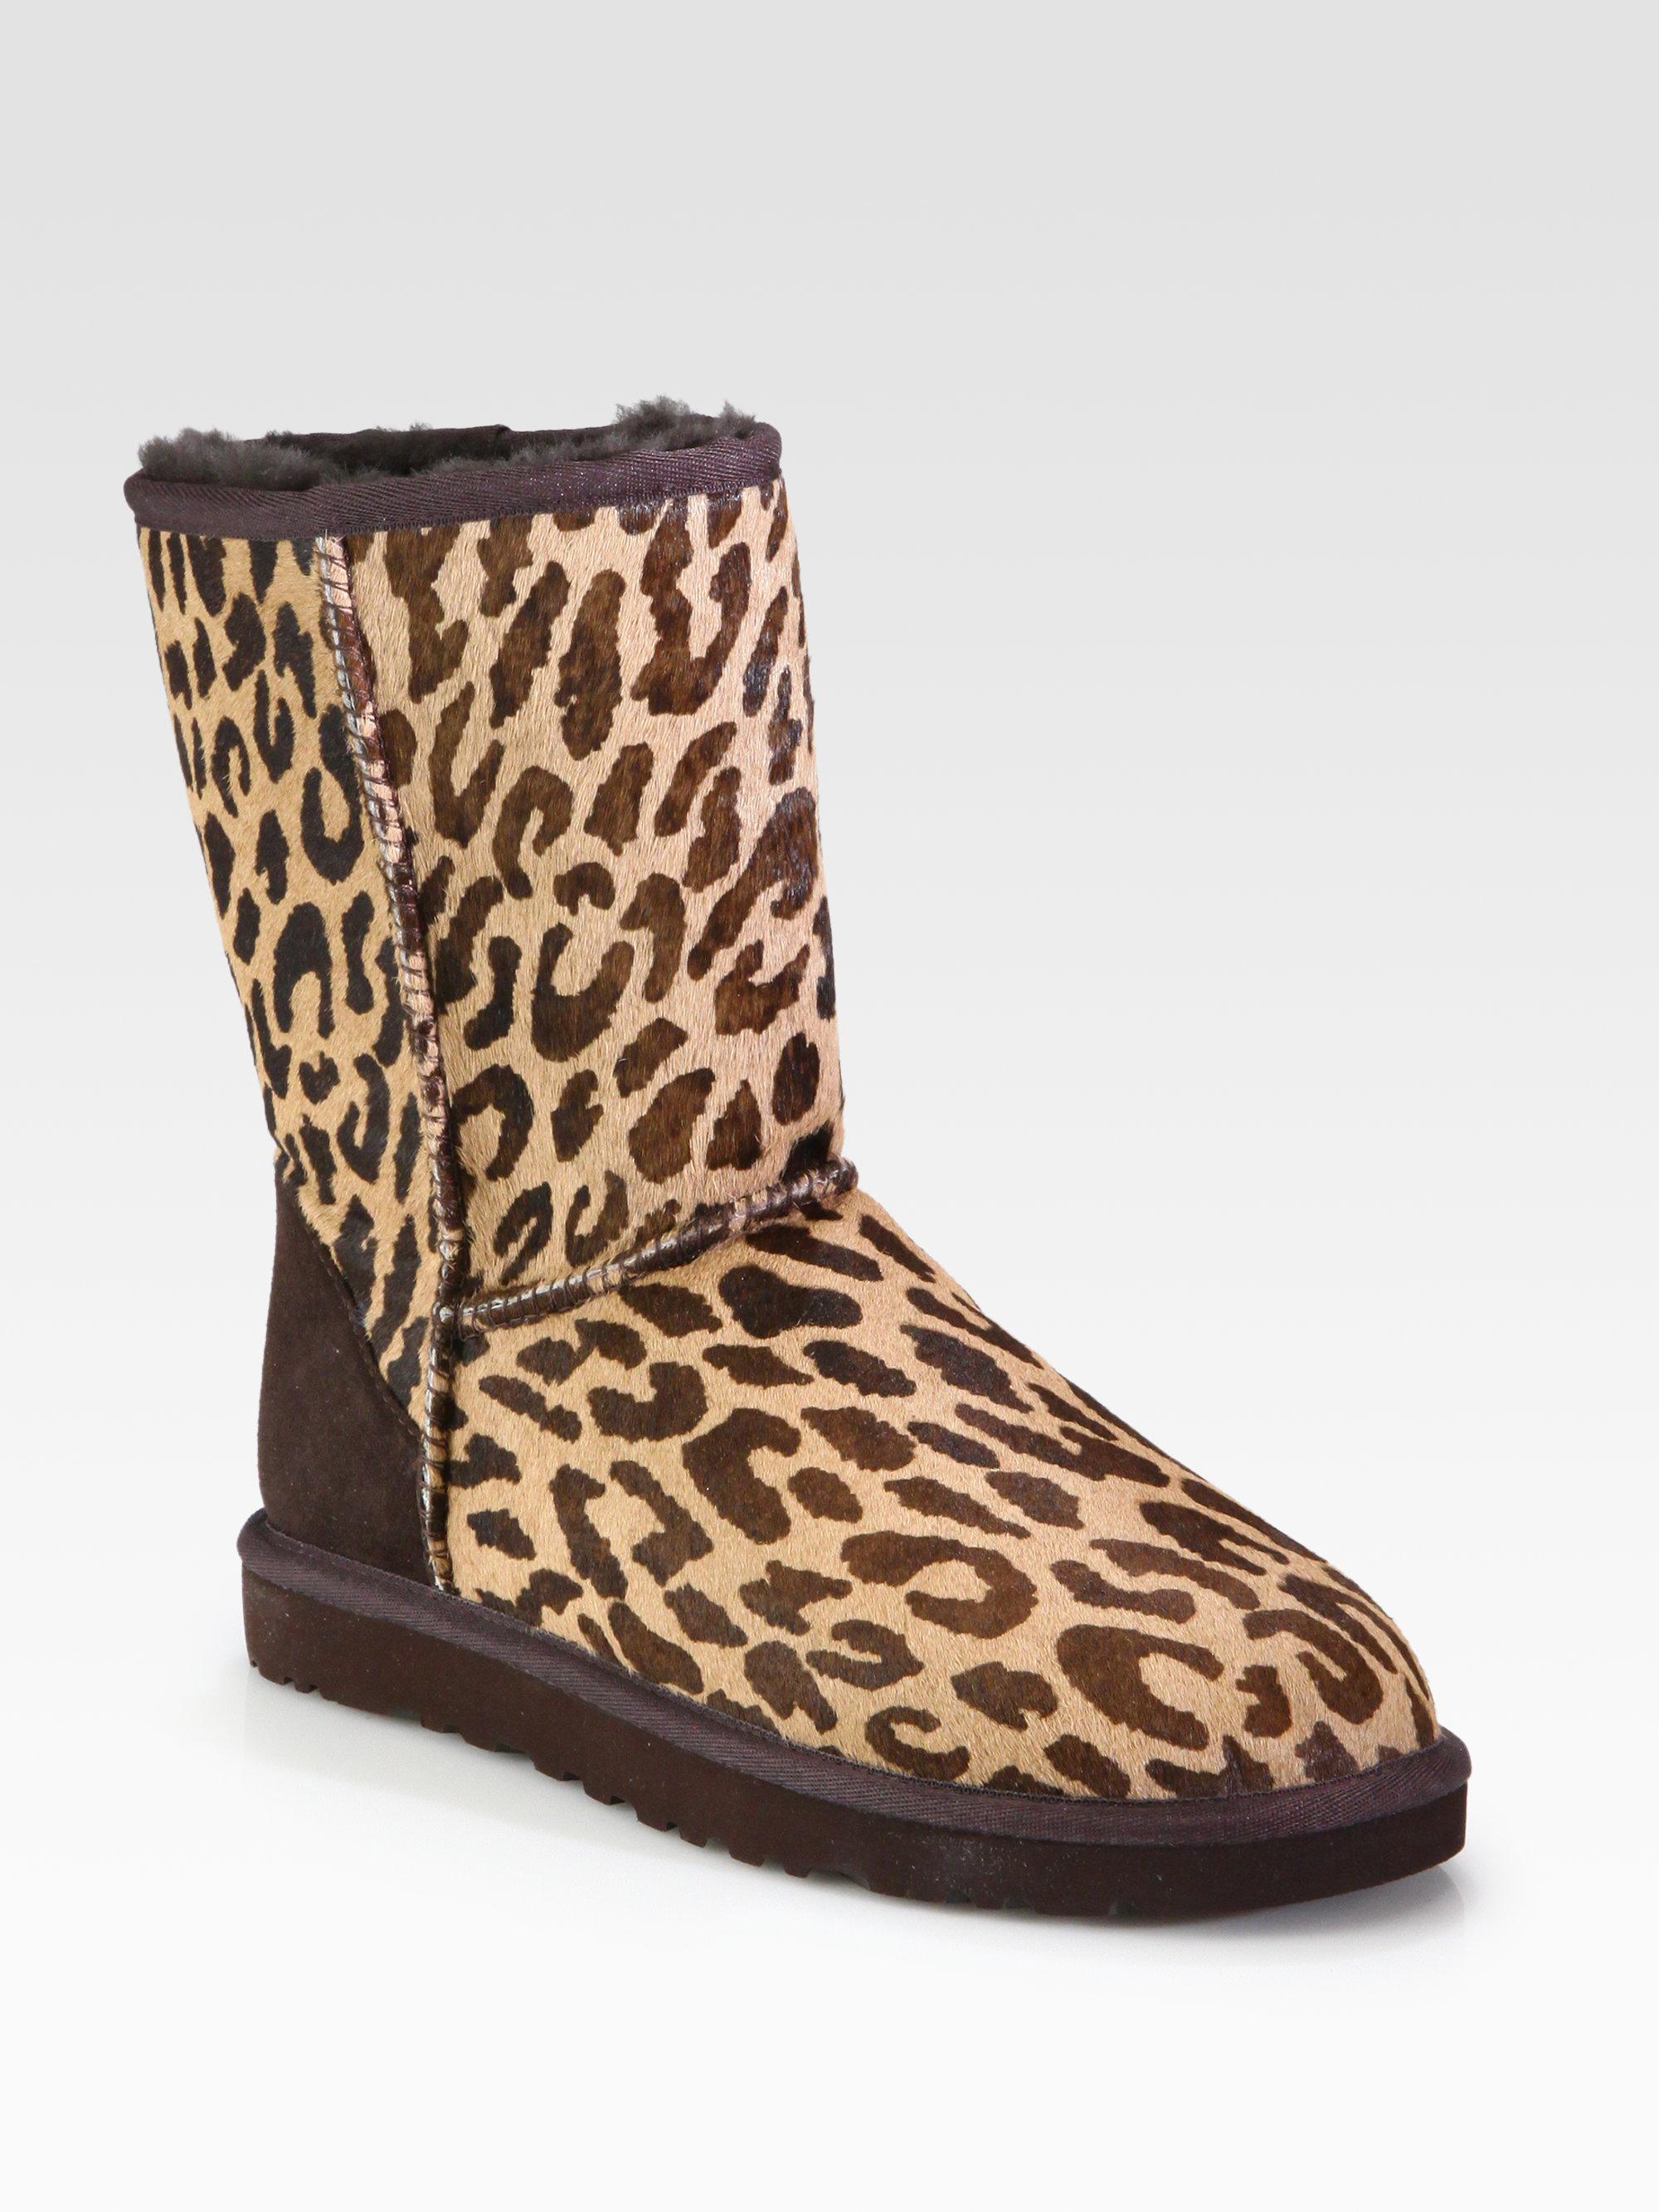 Ugg Classic Short Leopardprint Calf Hair Boots In Cheetah